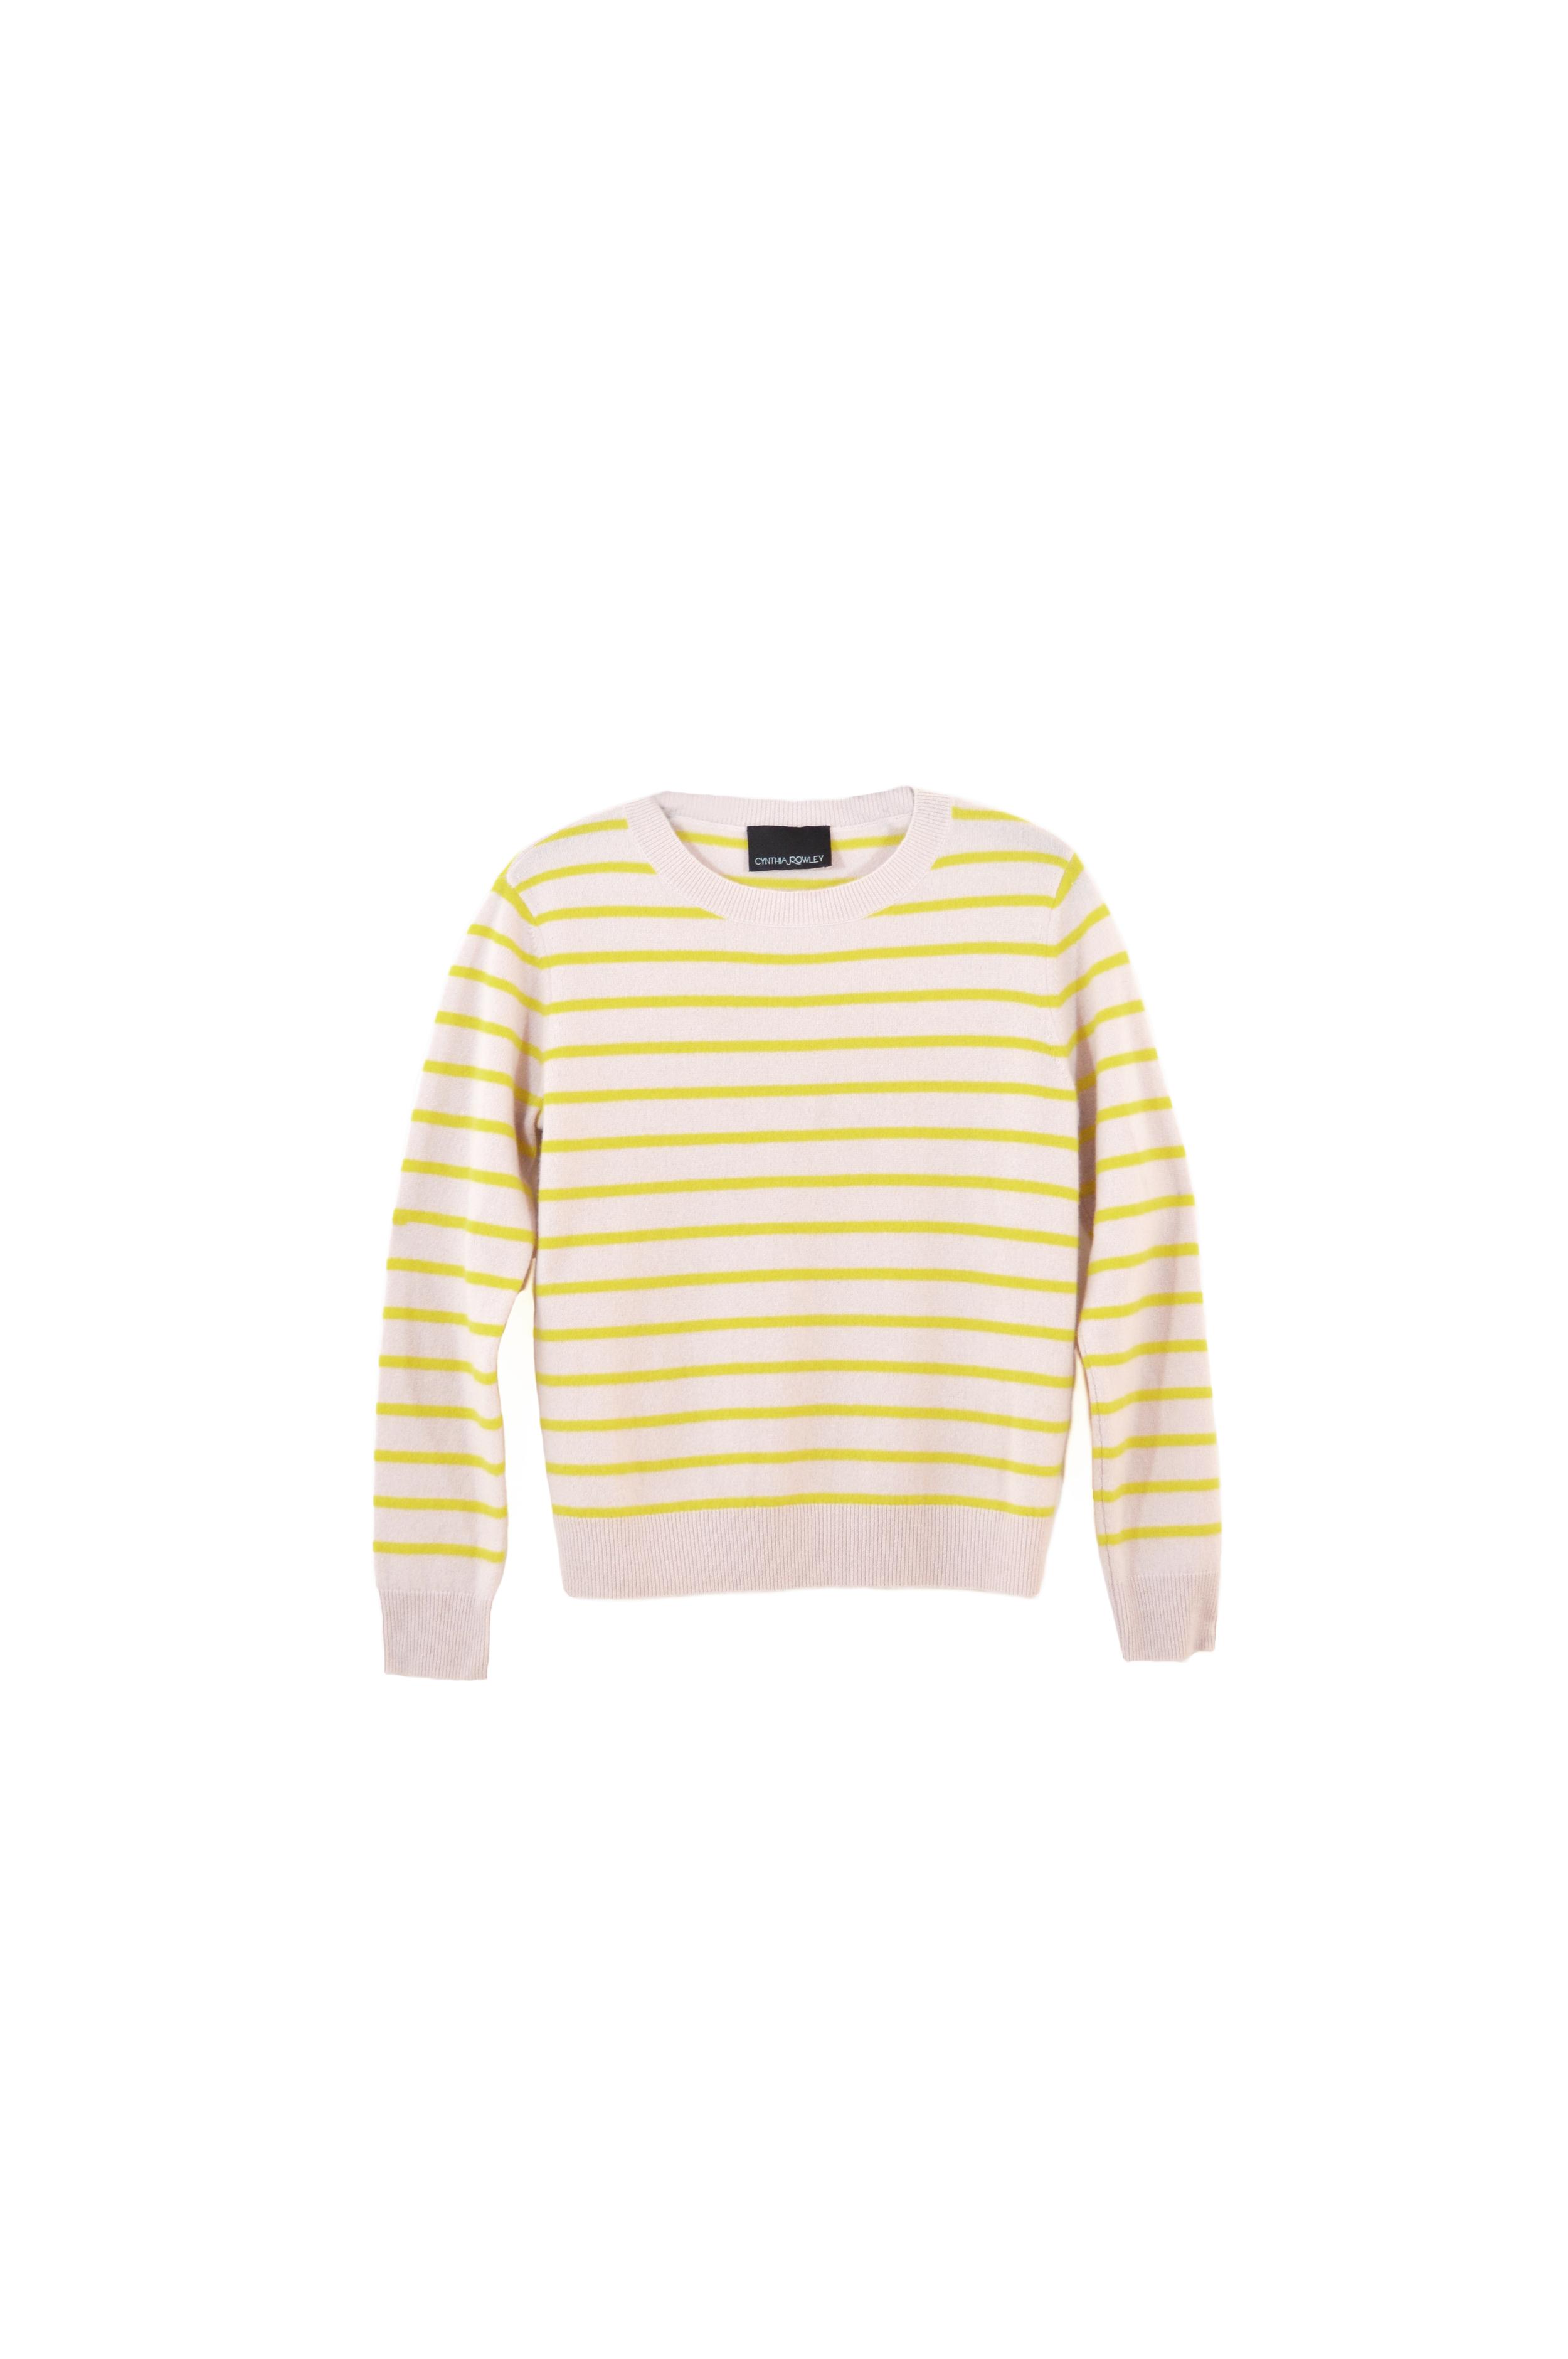 Cynthia Rowley stripe sweater.jpg